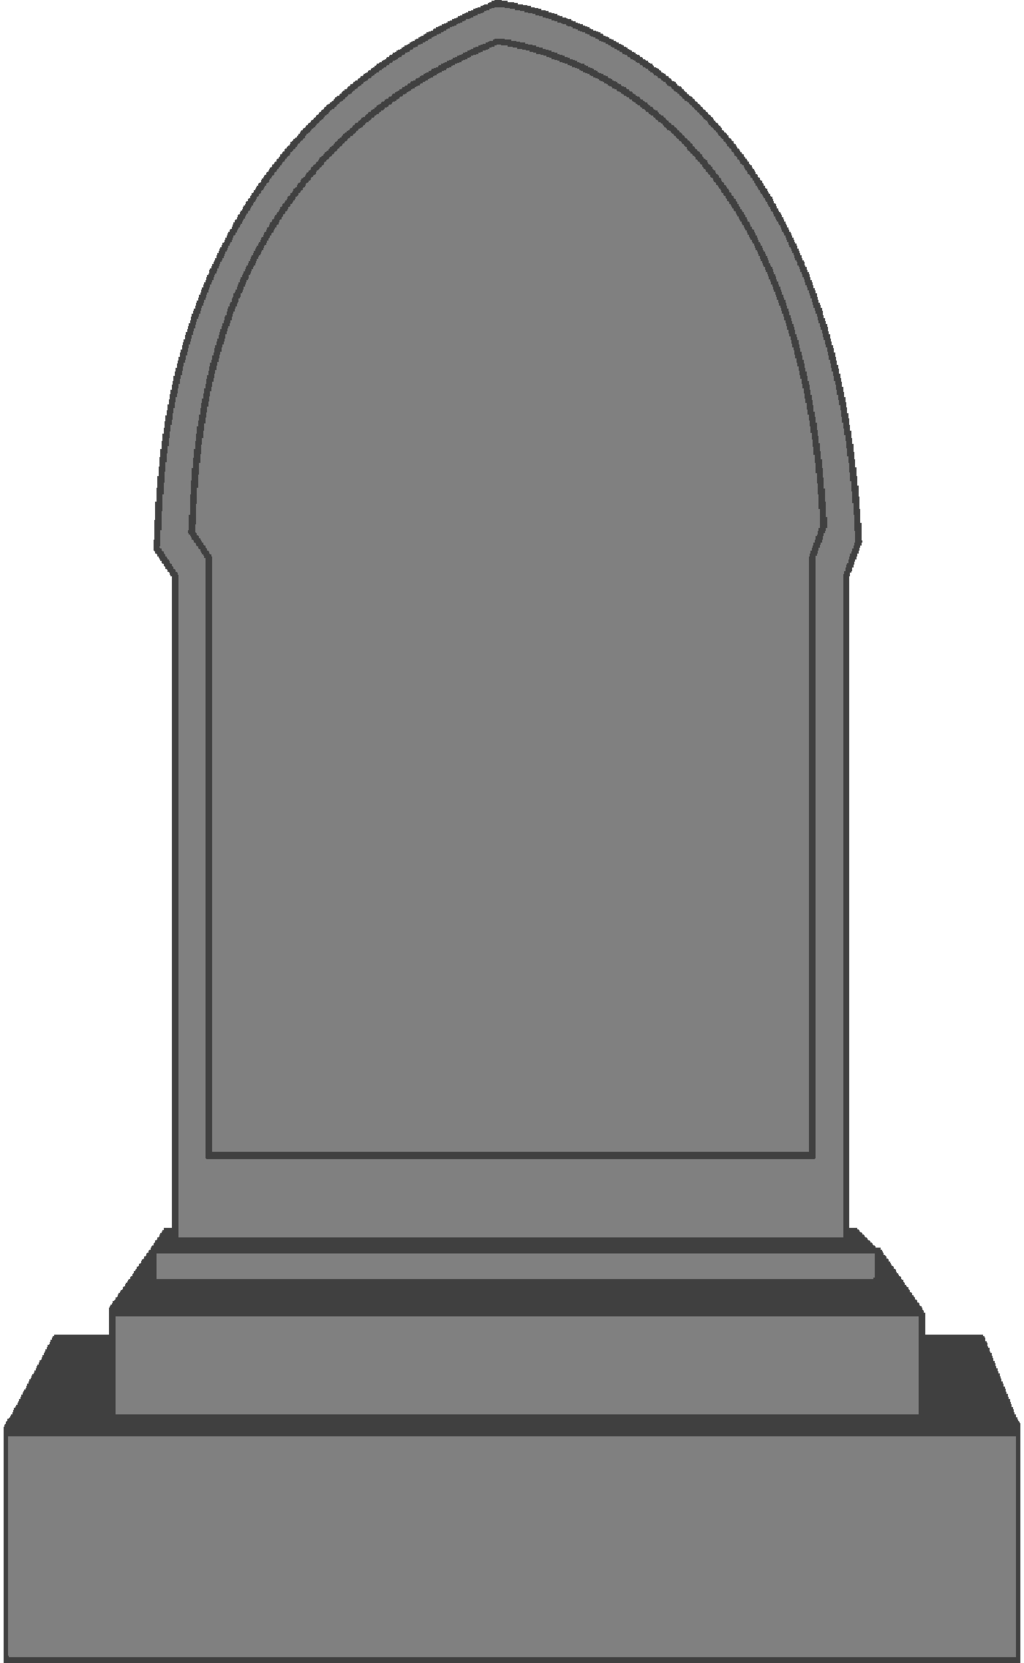 Gravestone Png Image Gravestone Tombstone Stele